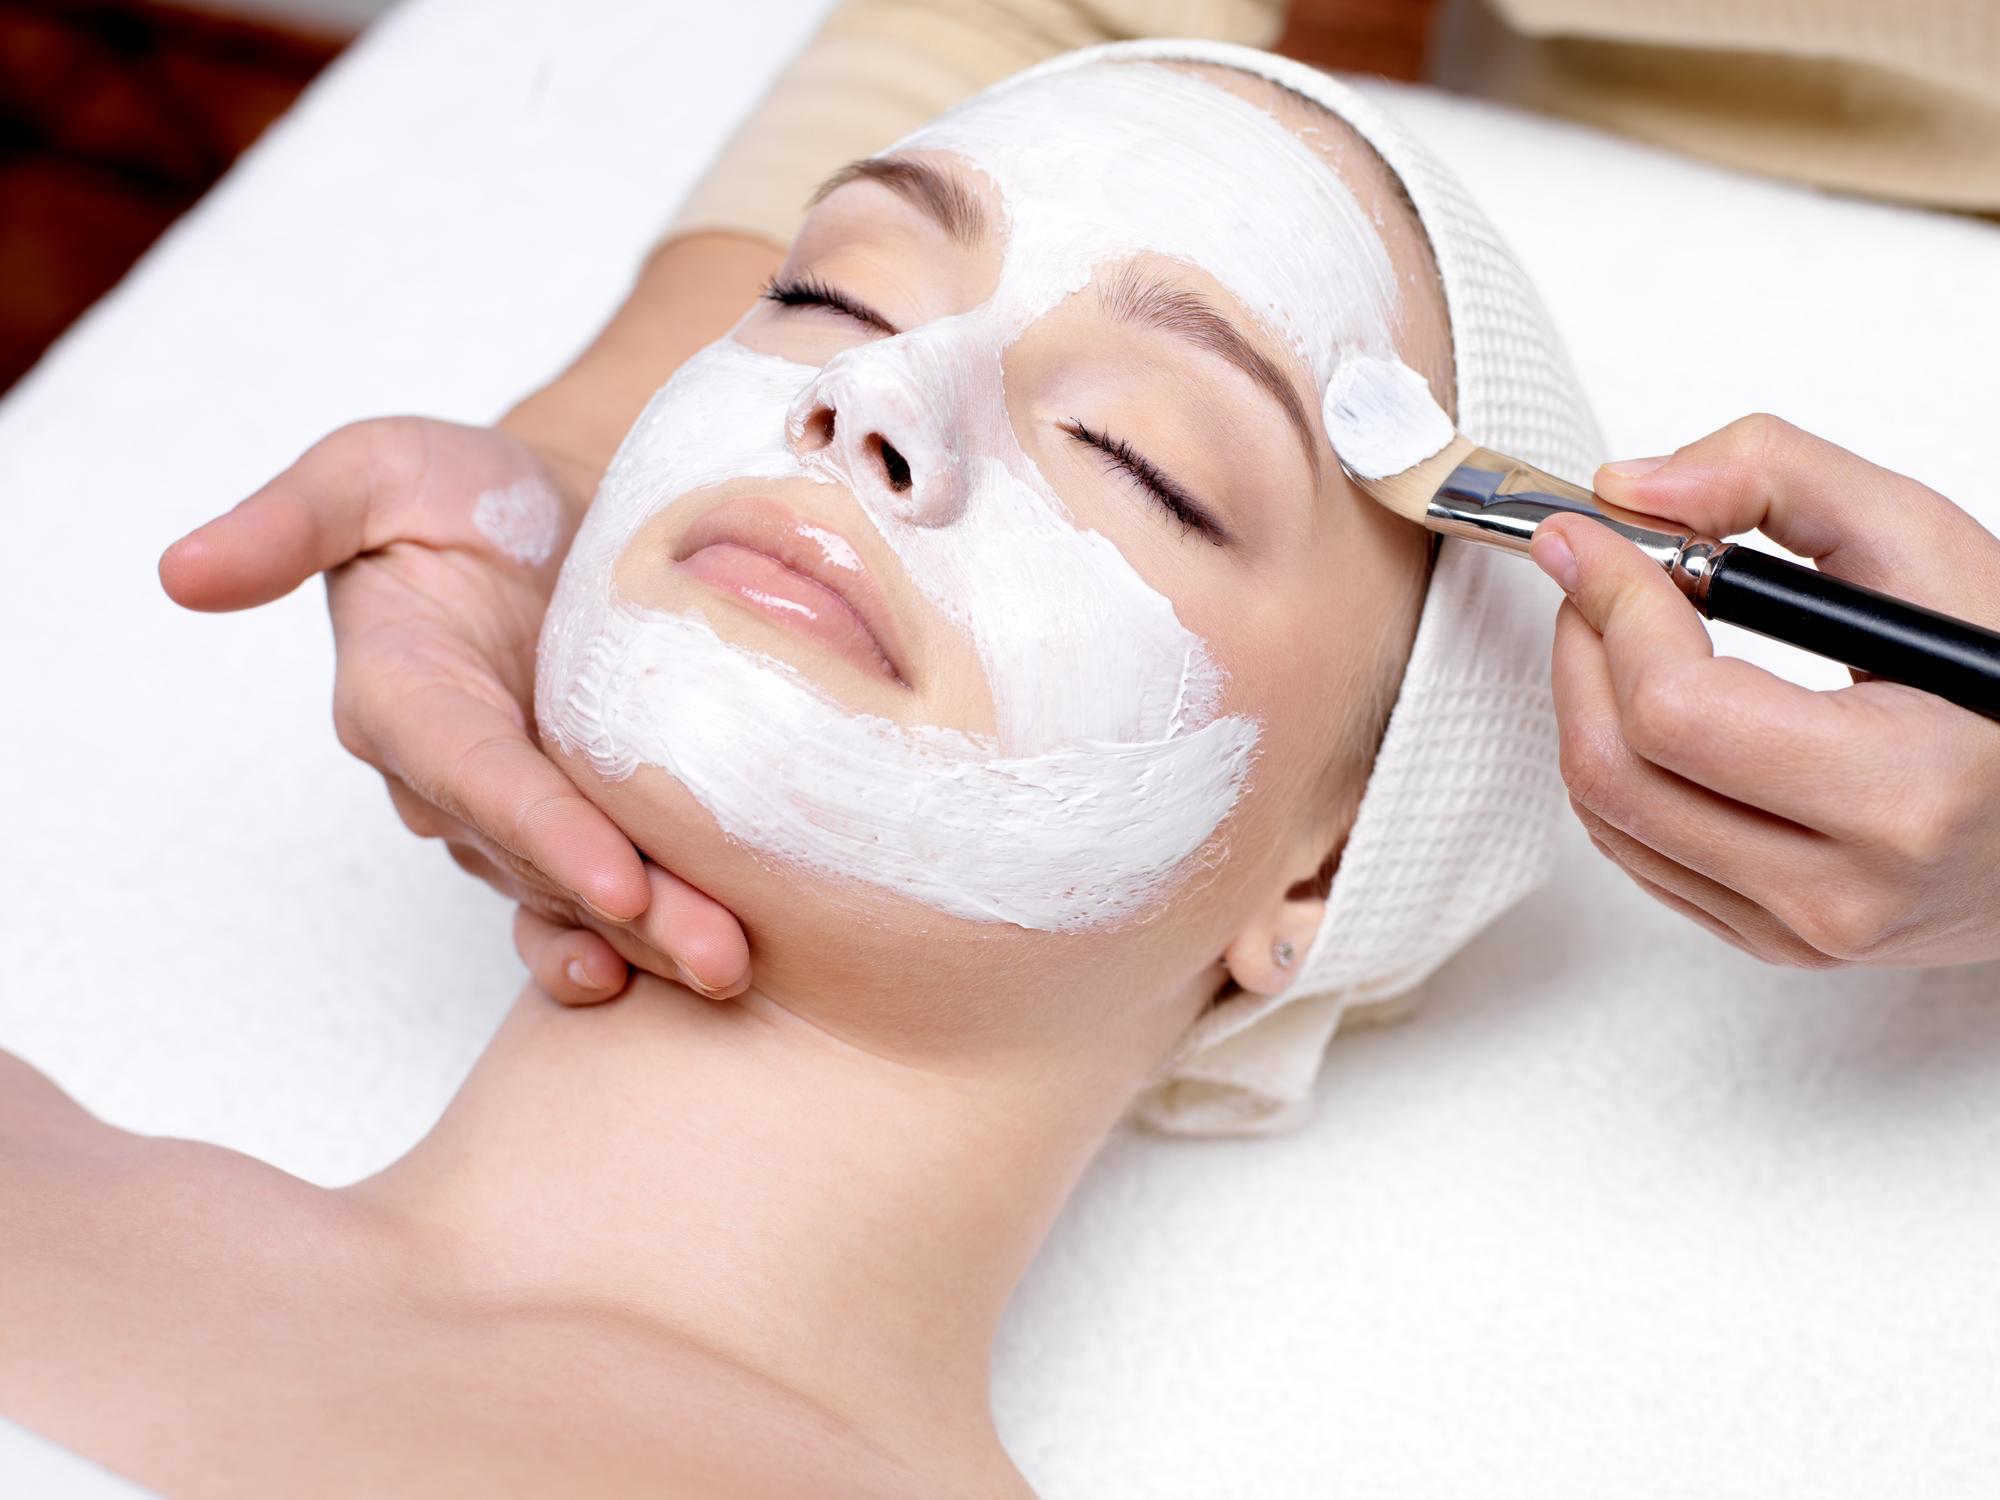 Nails & skincare - Manicures   Facials   Masks   Facial Waxing & Arching